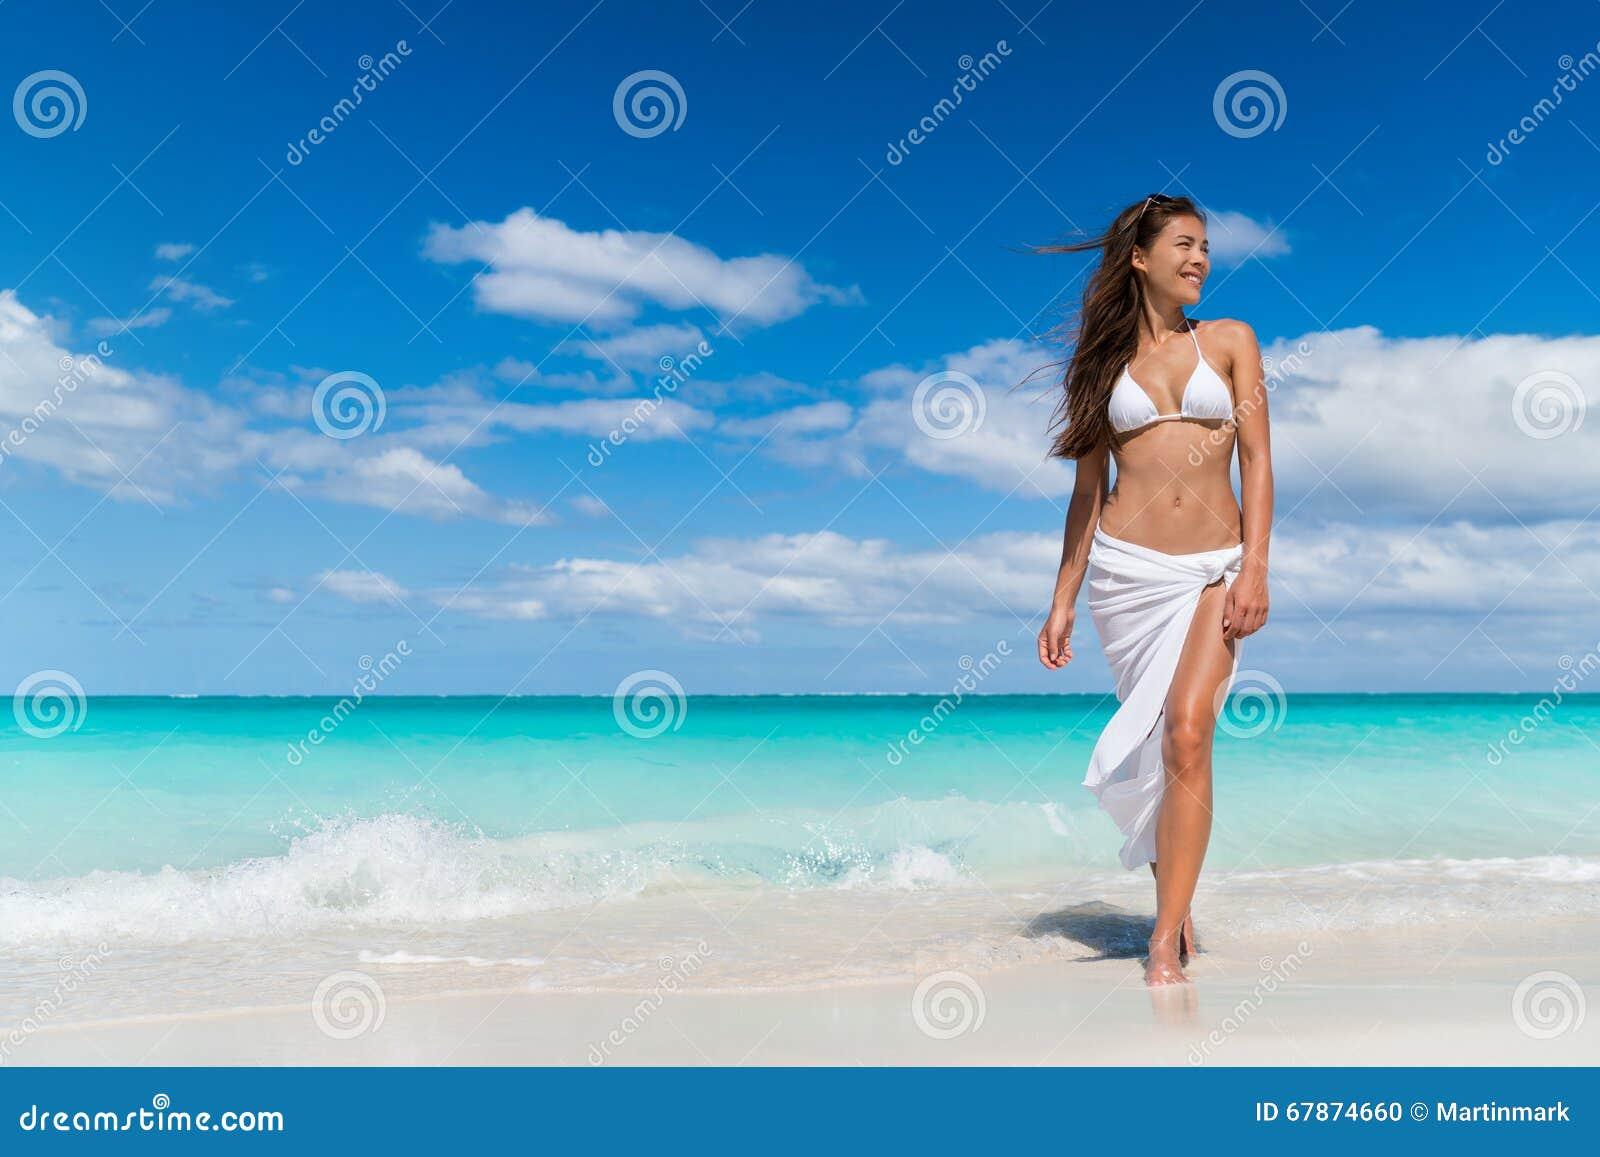 Ropa de playa para mujer blanca